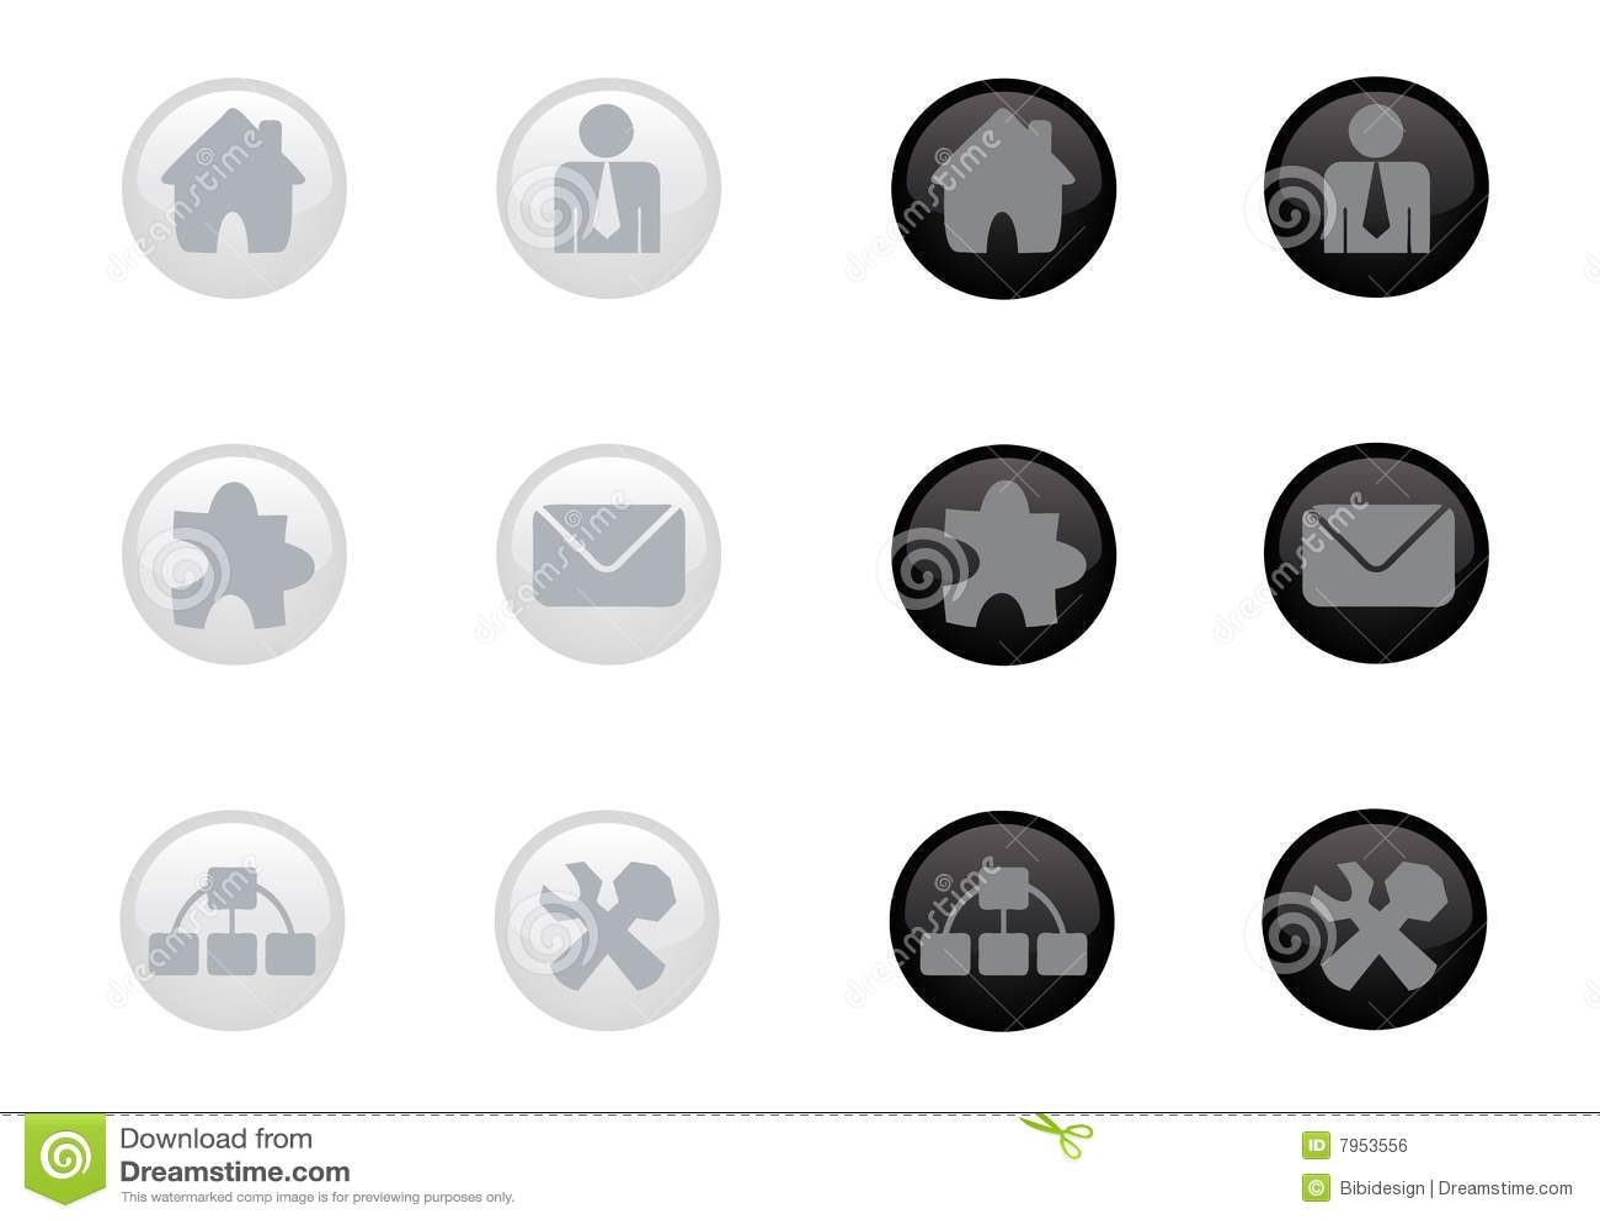 Glossy Web Icon Set